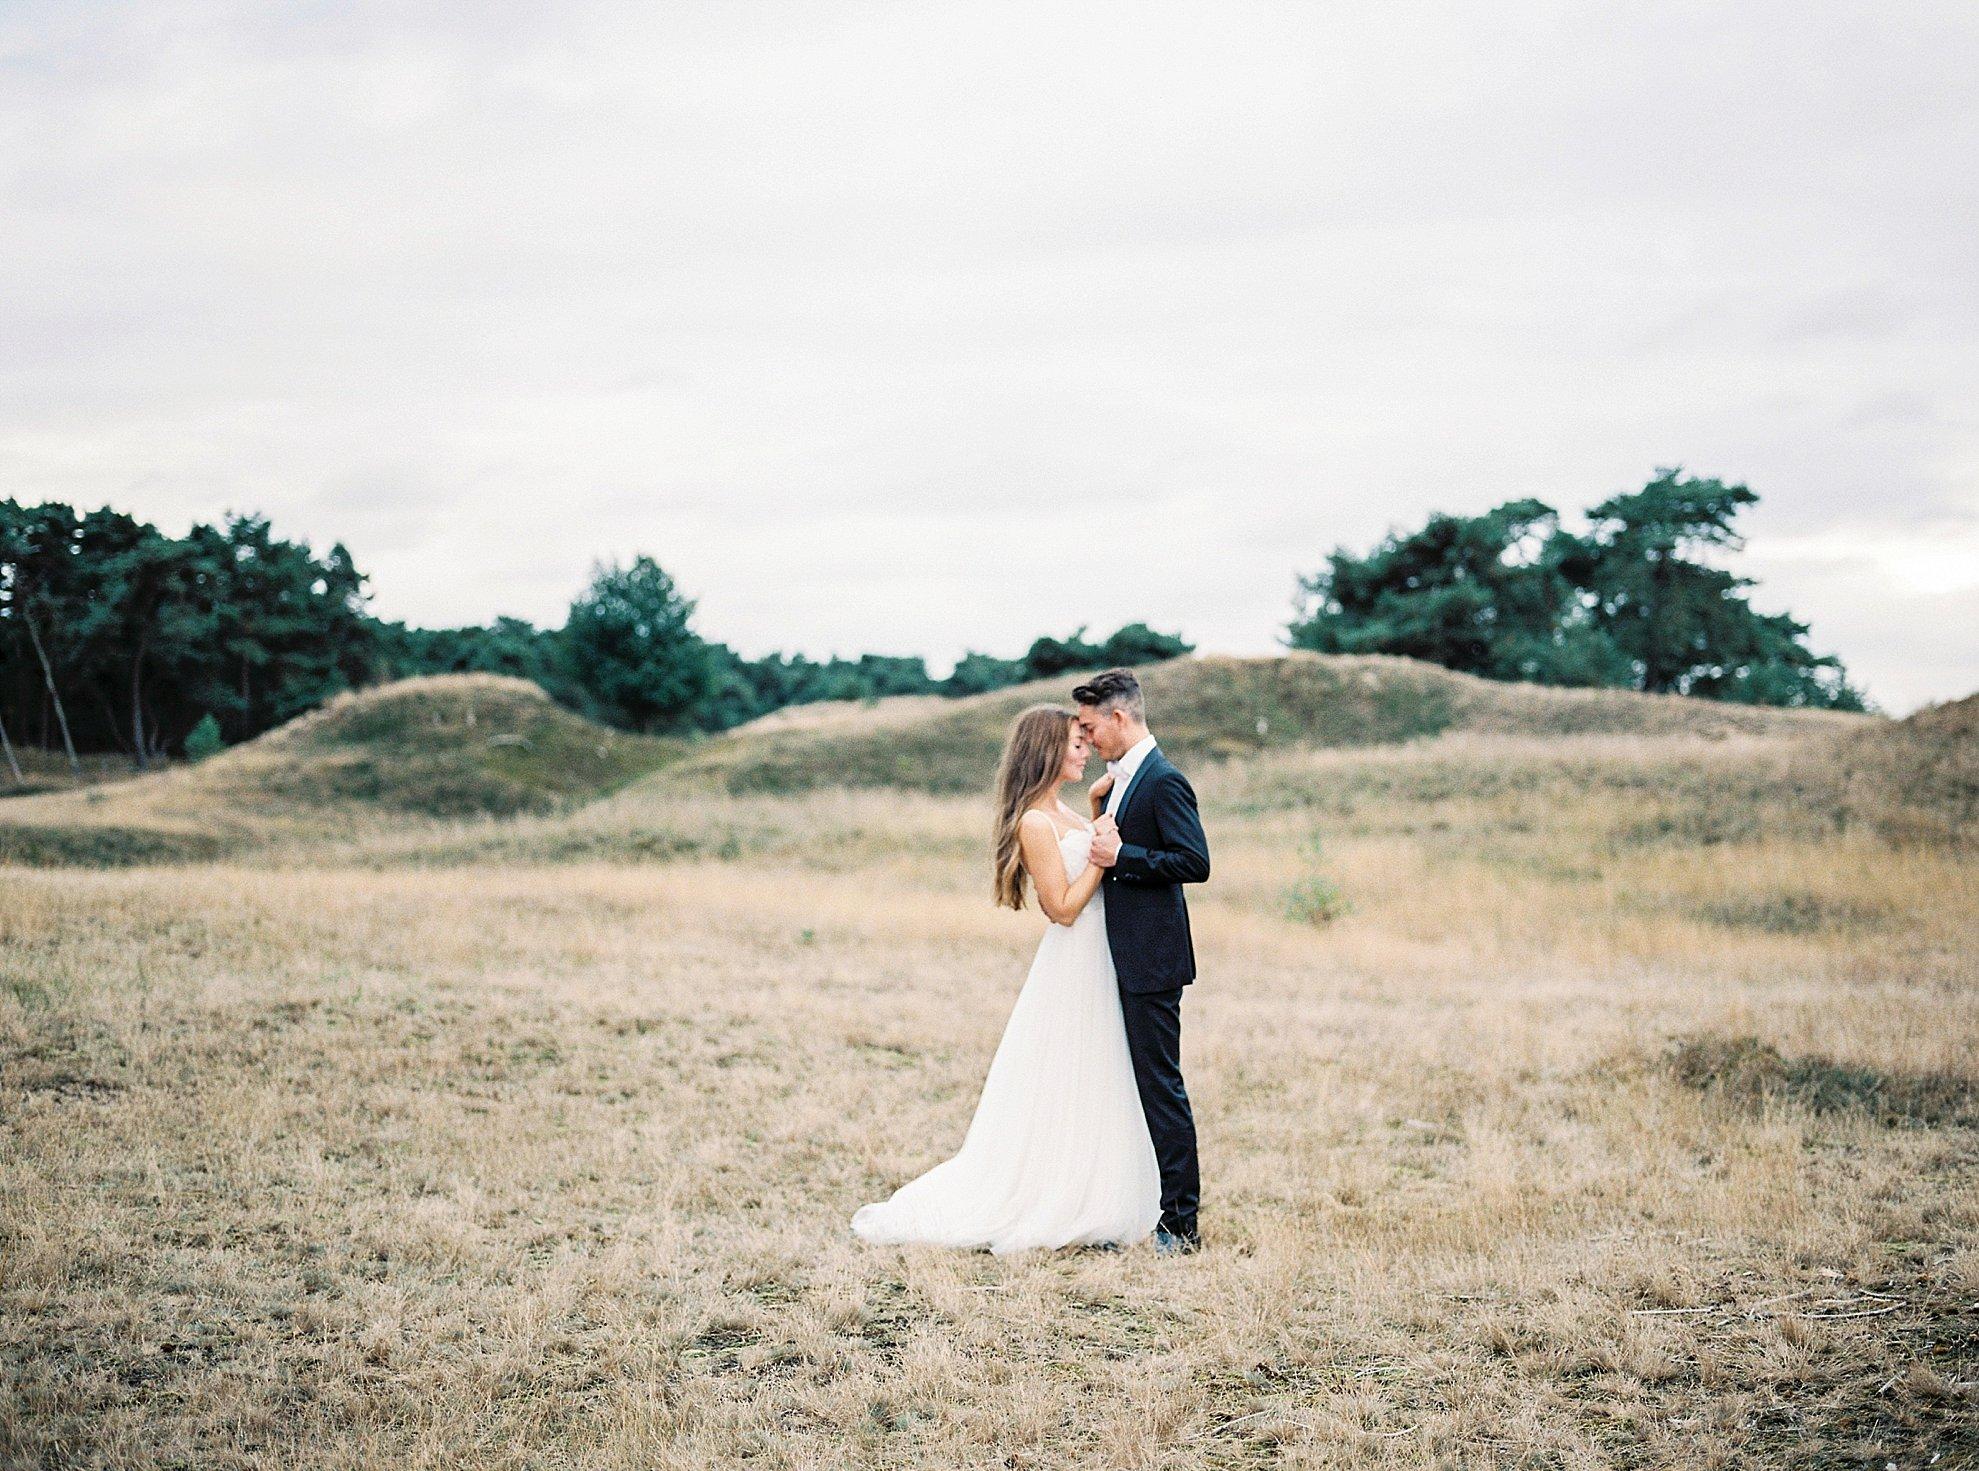 Amanda-Drost-photography-fine-art-nederland-couple-shoot-editorial_0010.jpg